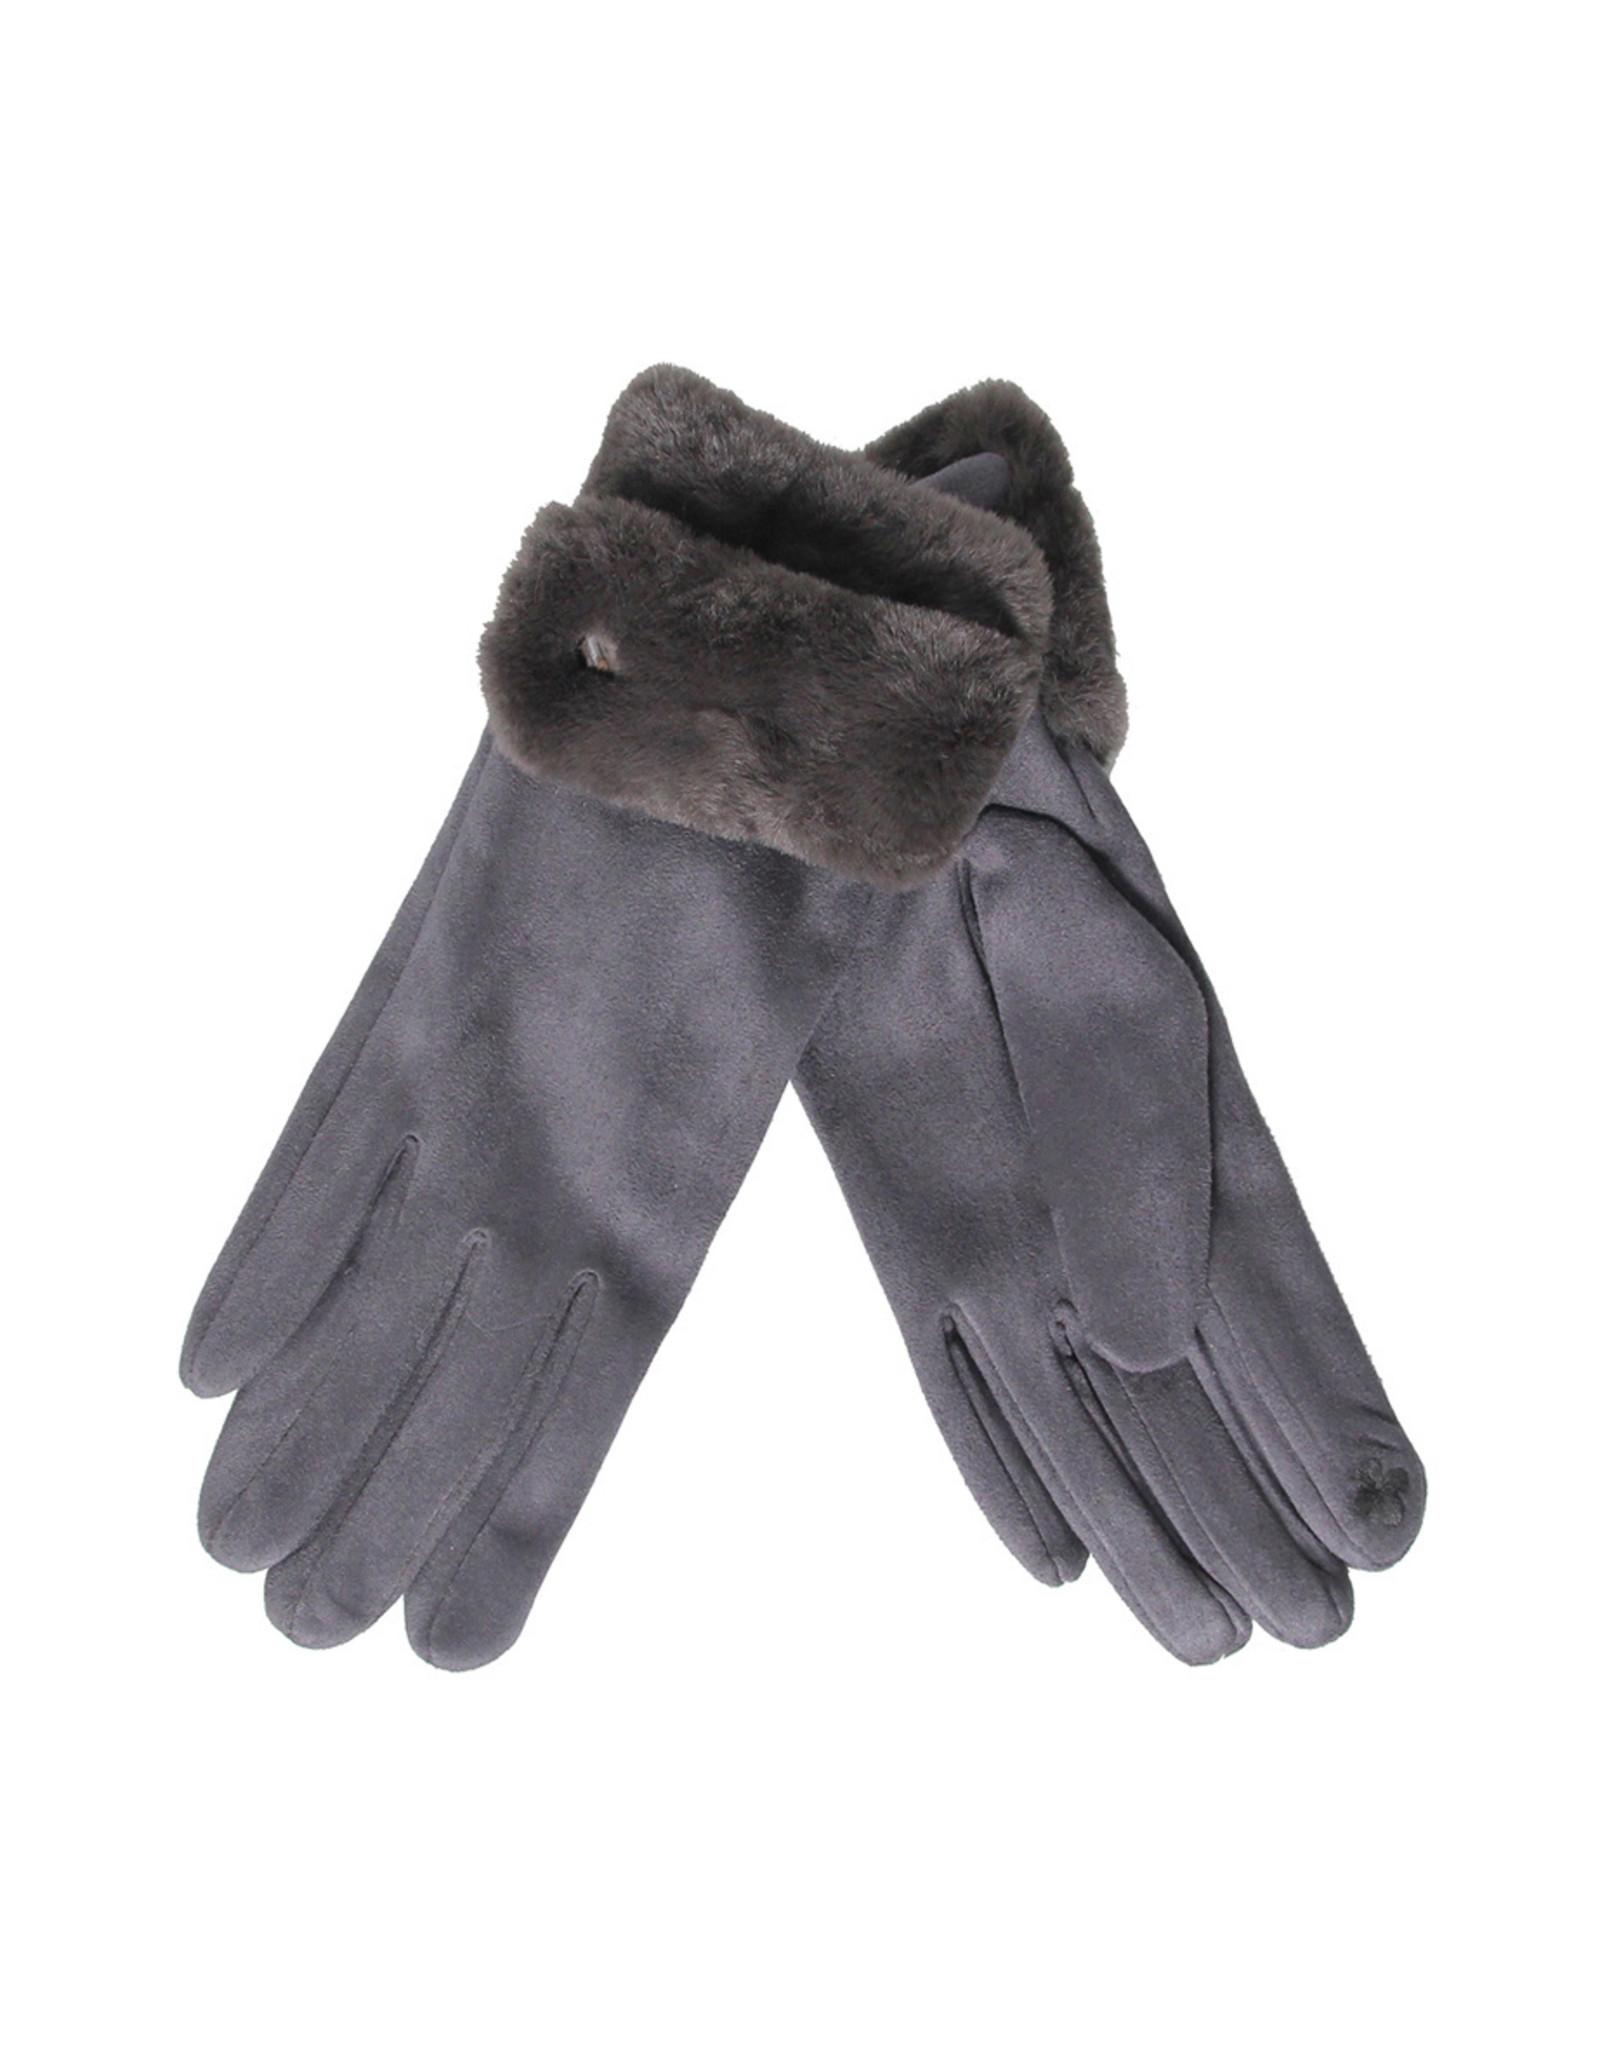 PARIS ES'TYL Fur Cuffed Gloves